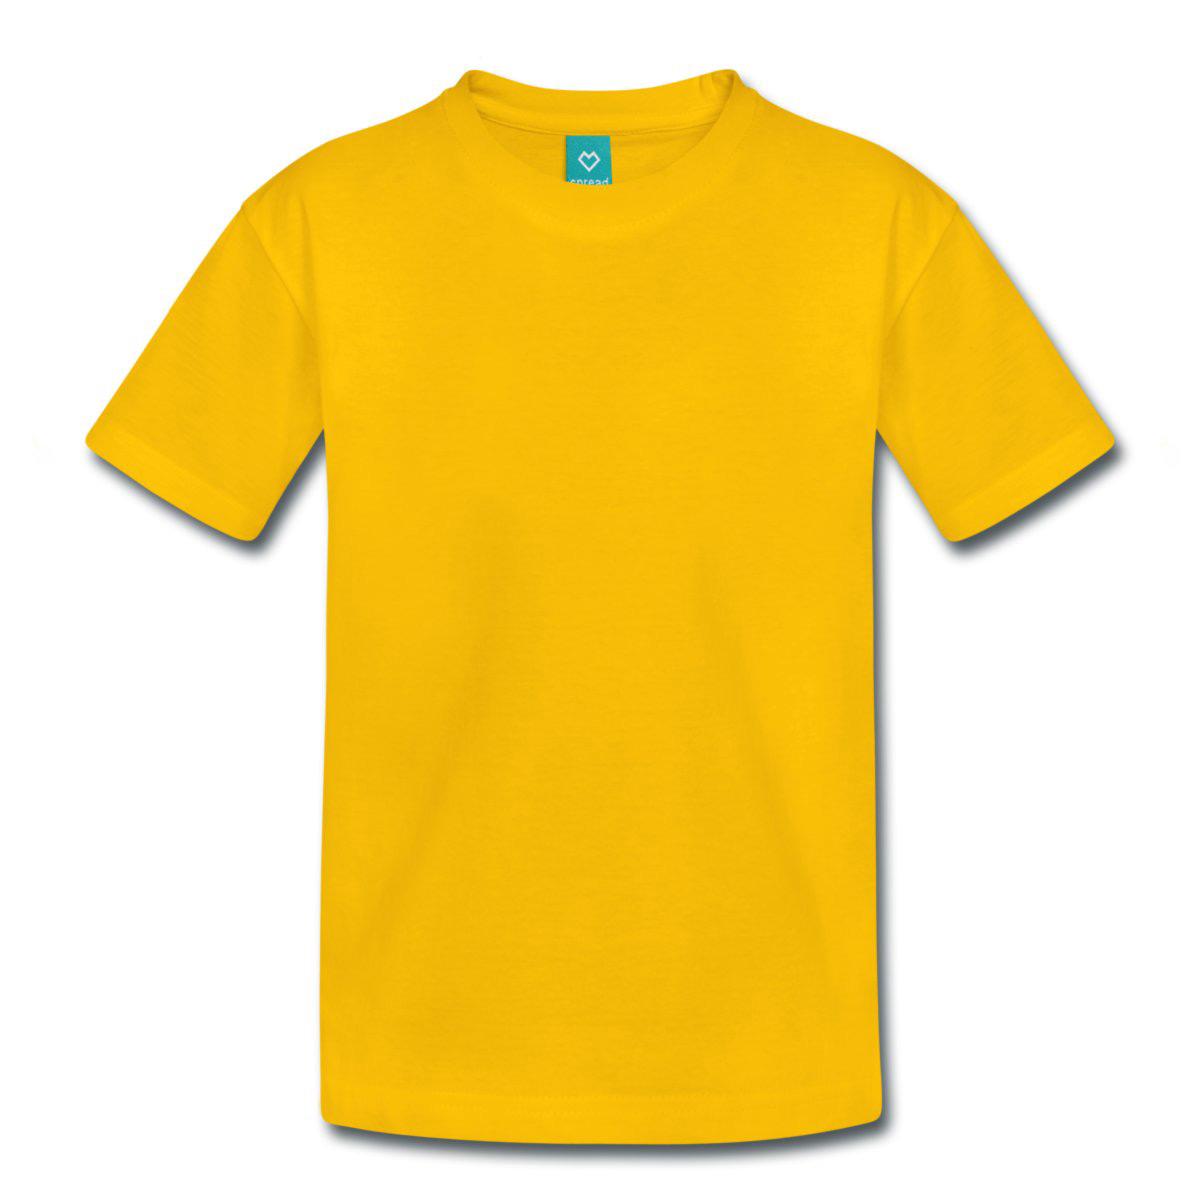 klassisches kinder t shirt mit eigener beschriftung. Black Bedroom Furniture Sets. Home Design Ideas